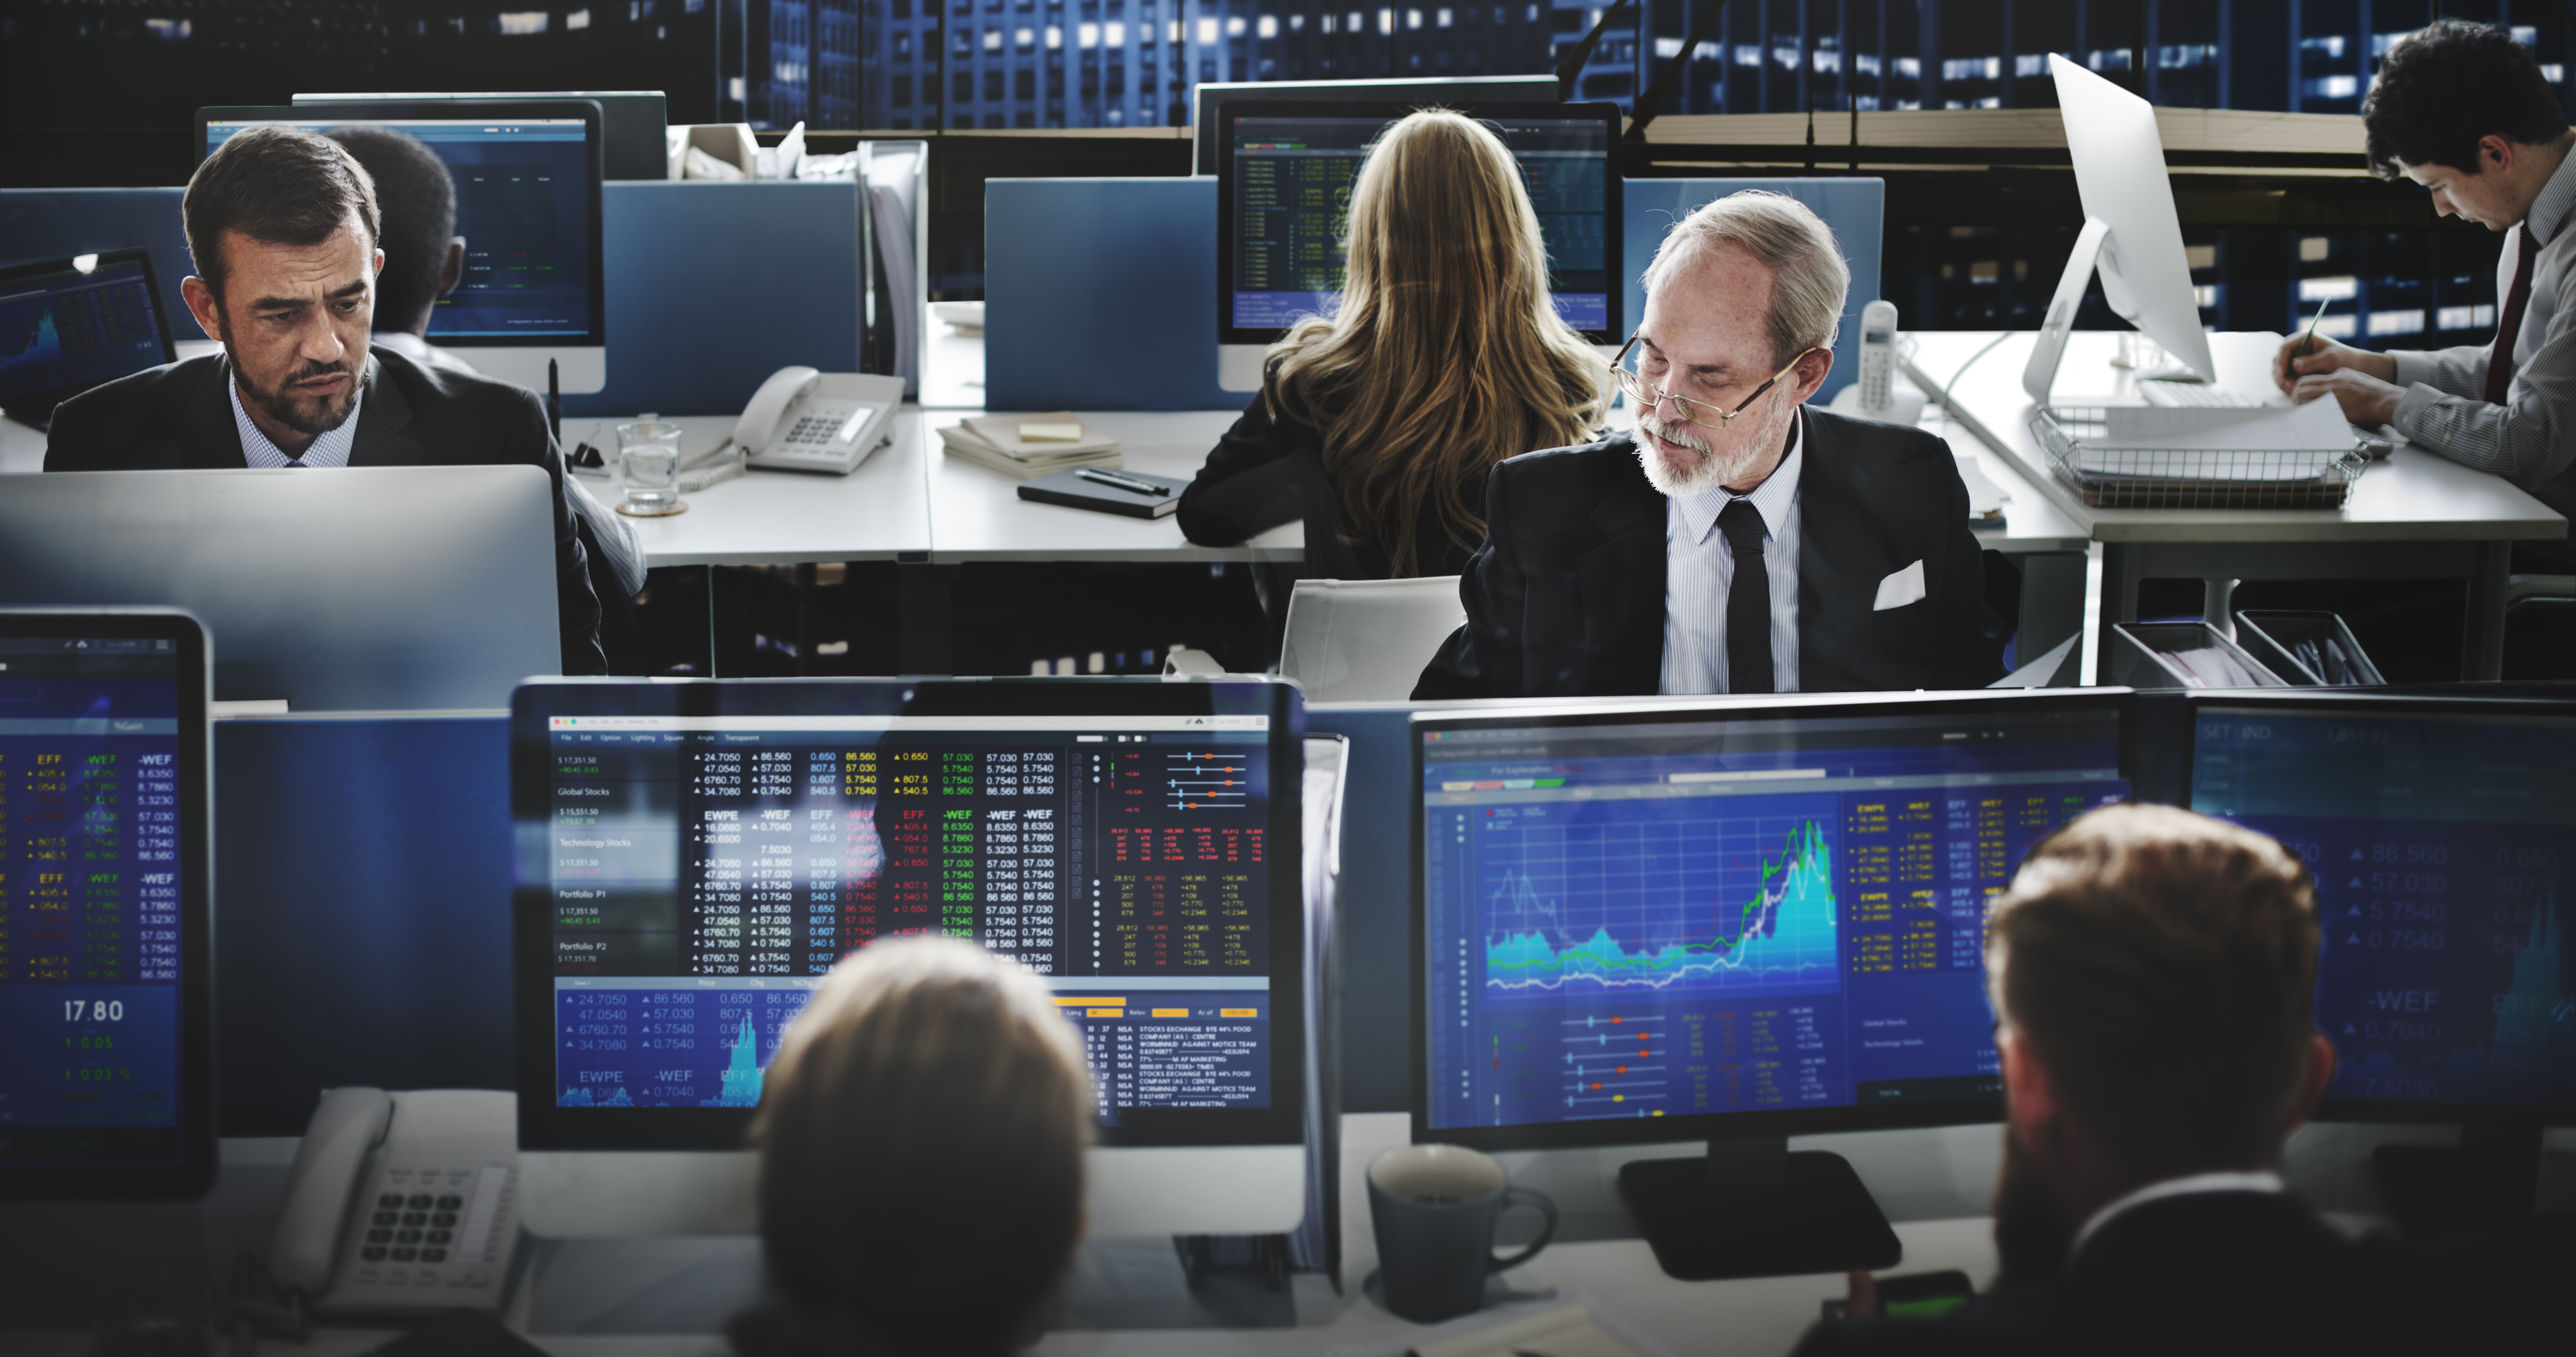 forex prop trading firms hiring